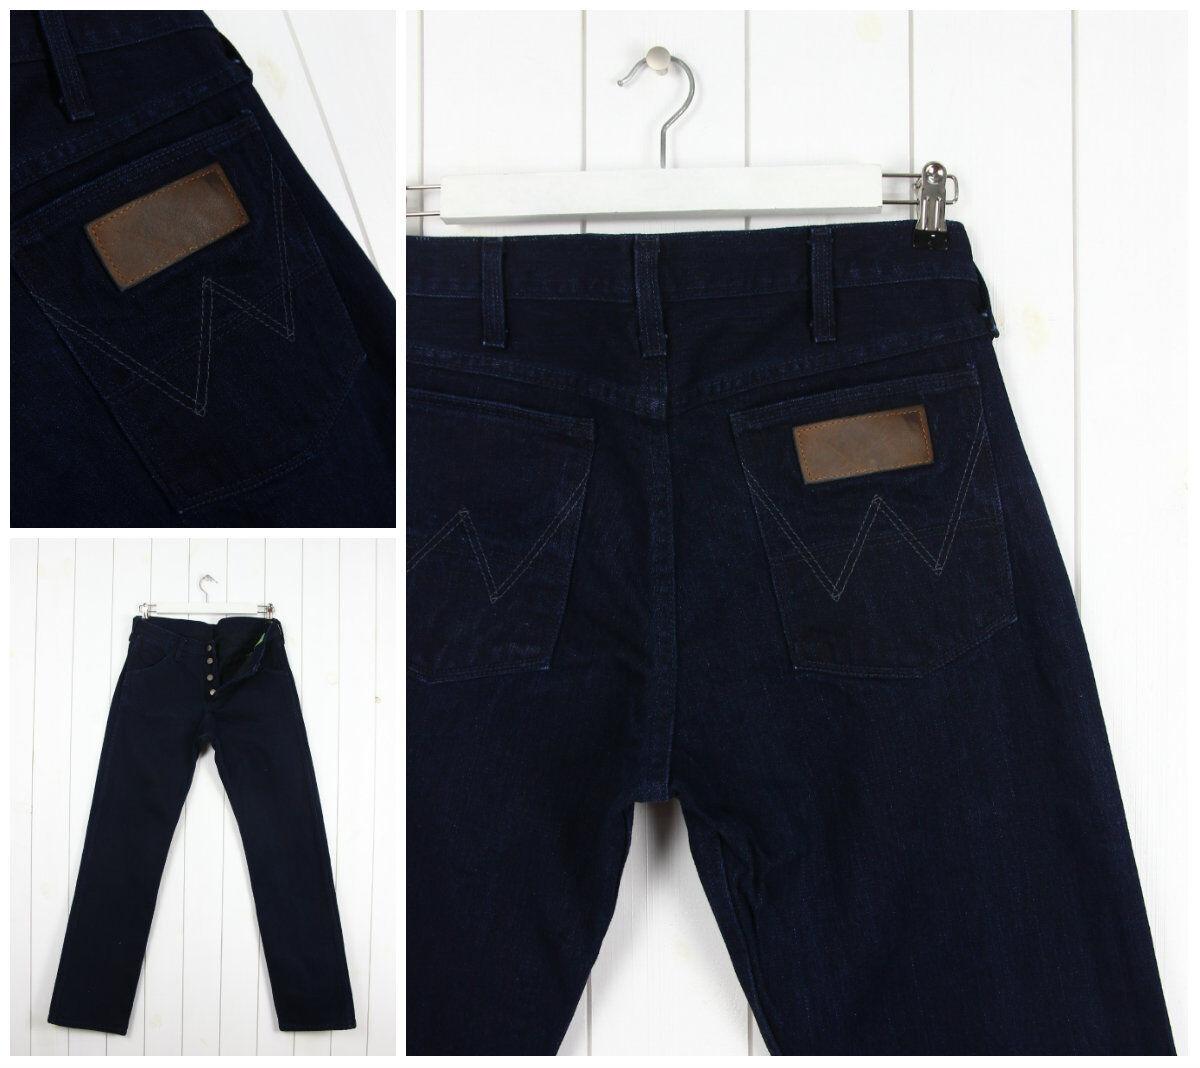 NEU Wrangler Blau Glocke 11MW 1956' Vintage blau regular gerade Jeans W32 L34